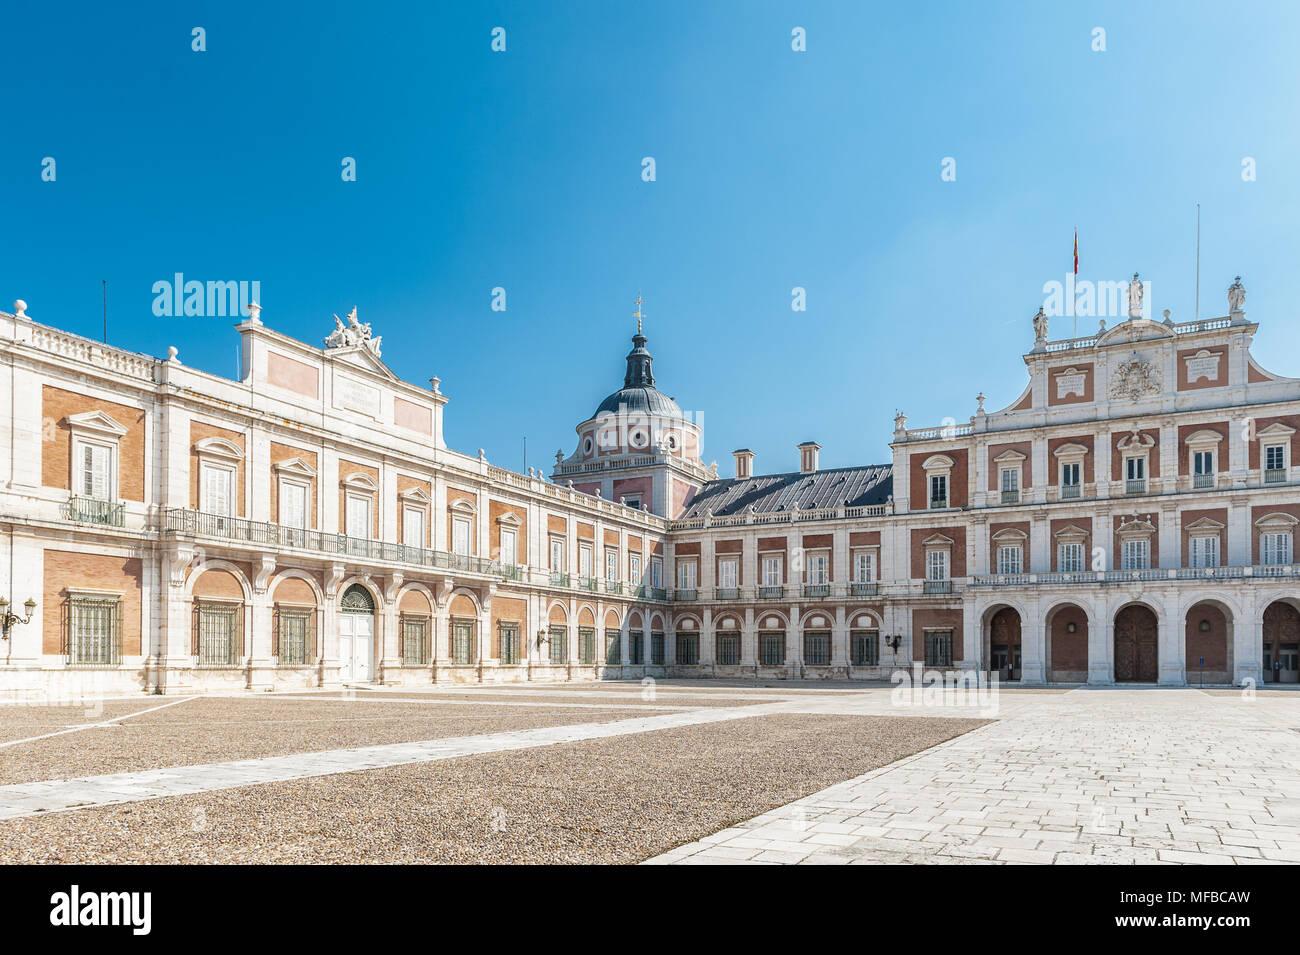 Royal Palace Madrid Aranjuez Interior Imágenes De Stock & Royal ...